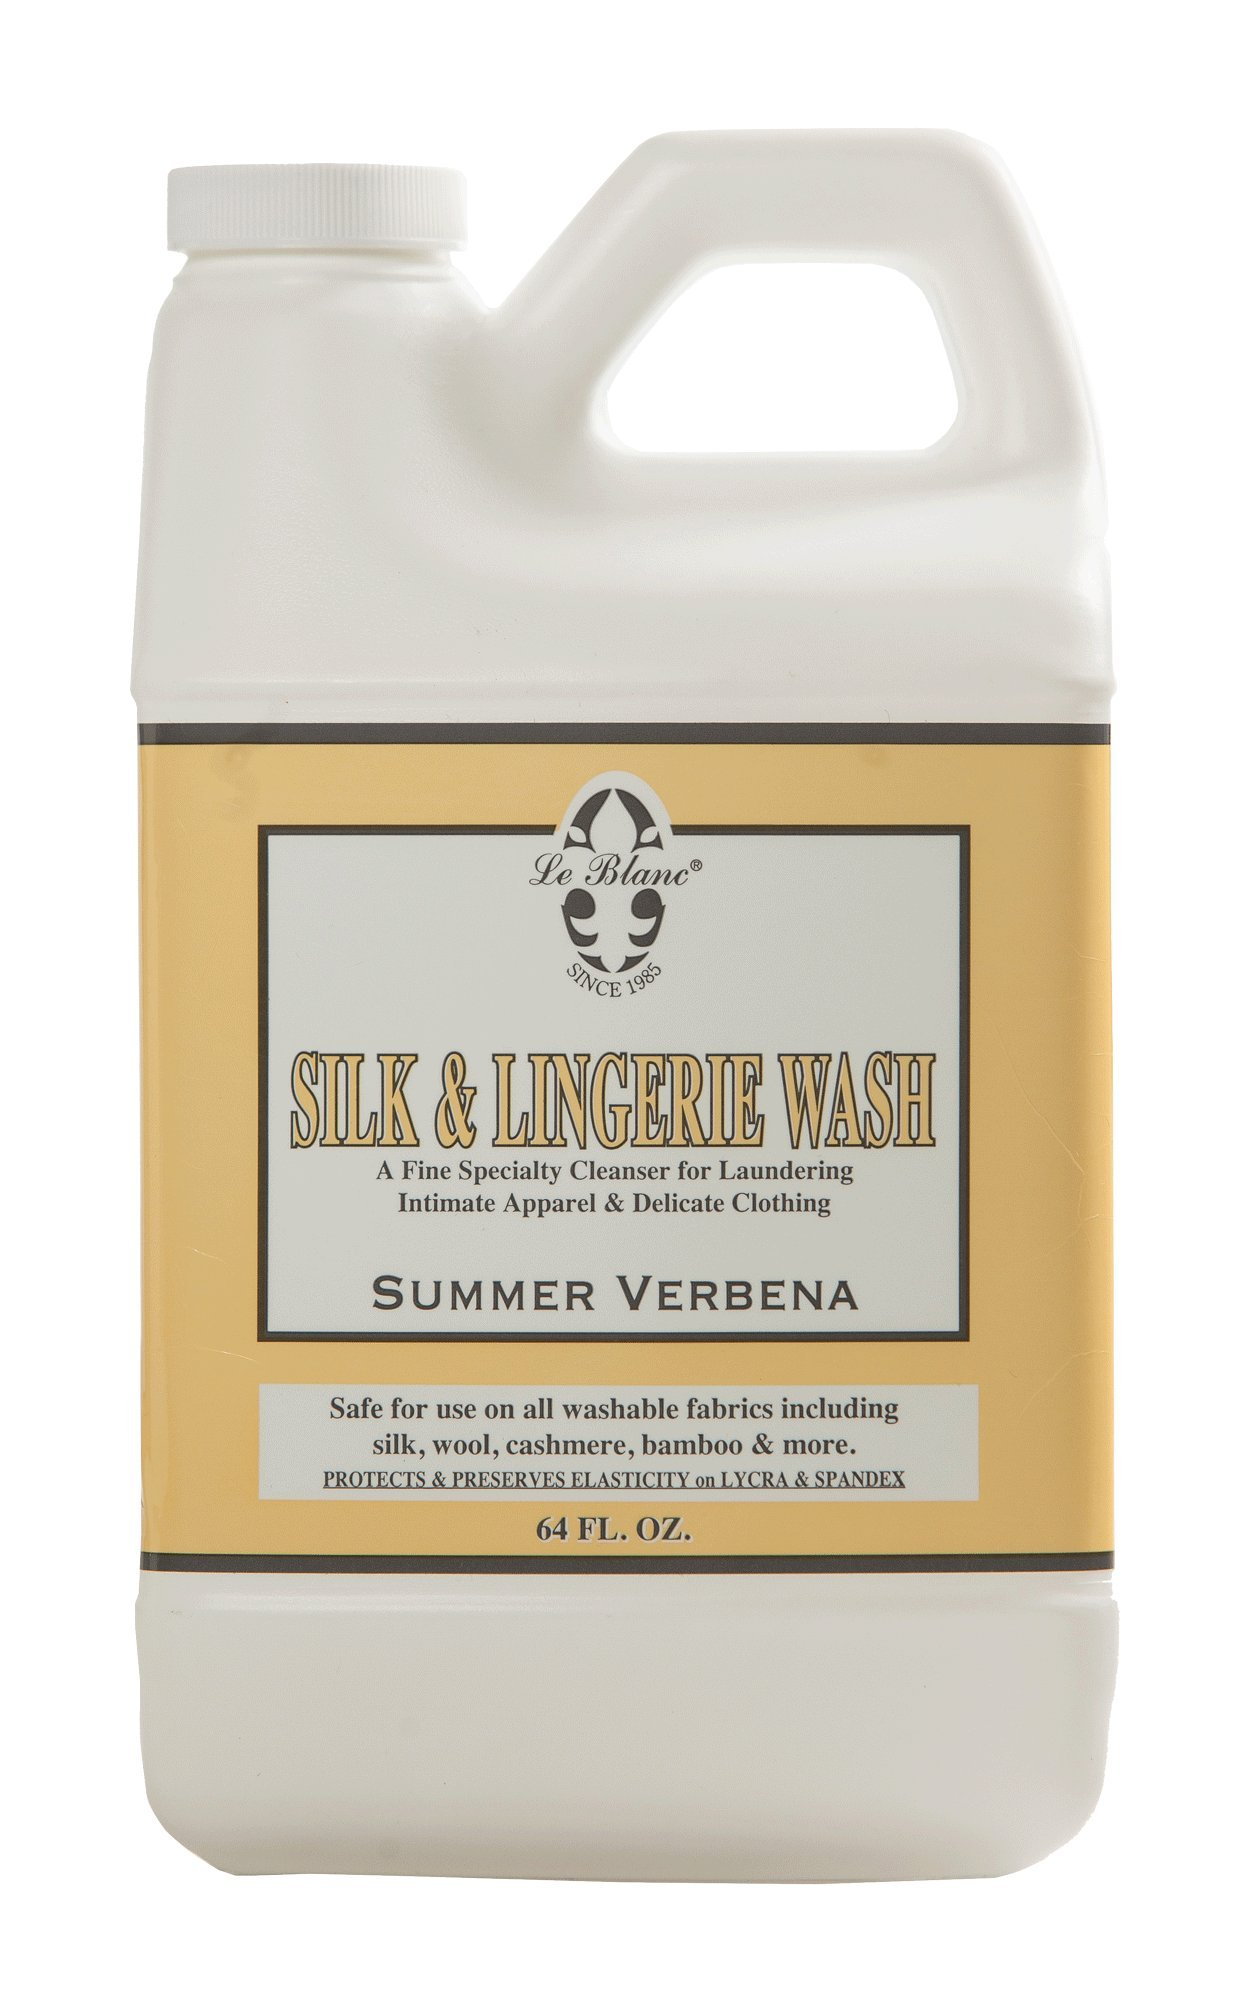 Le Blanc Summer Verbena Silk & Lingerie Wash - 64 FL. OZ., 3 Pack